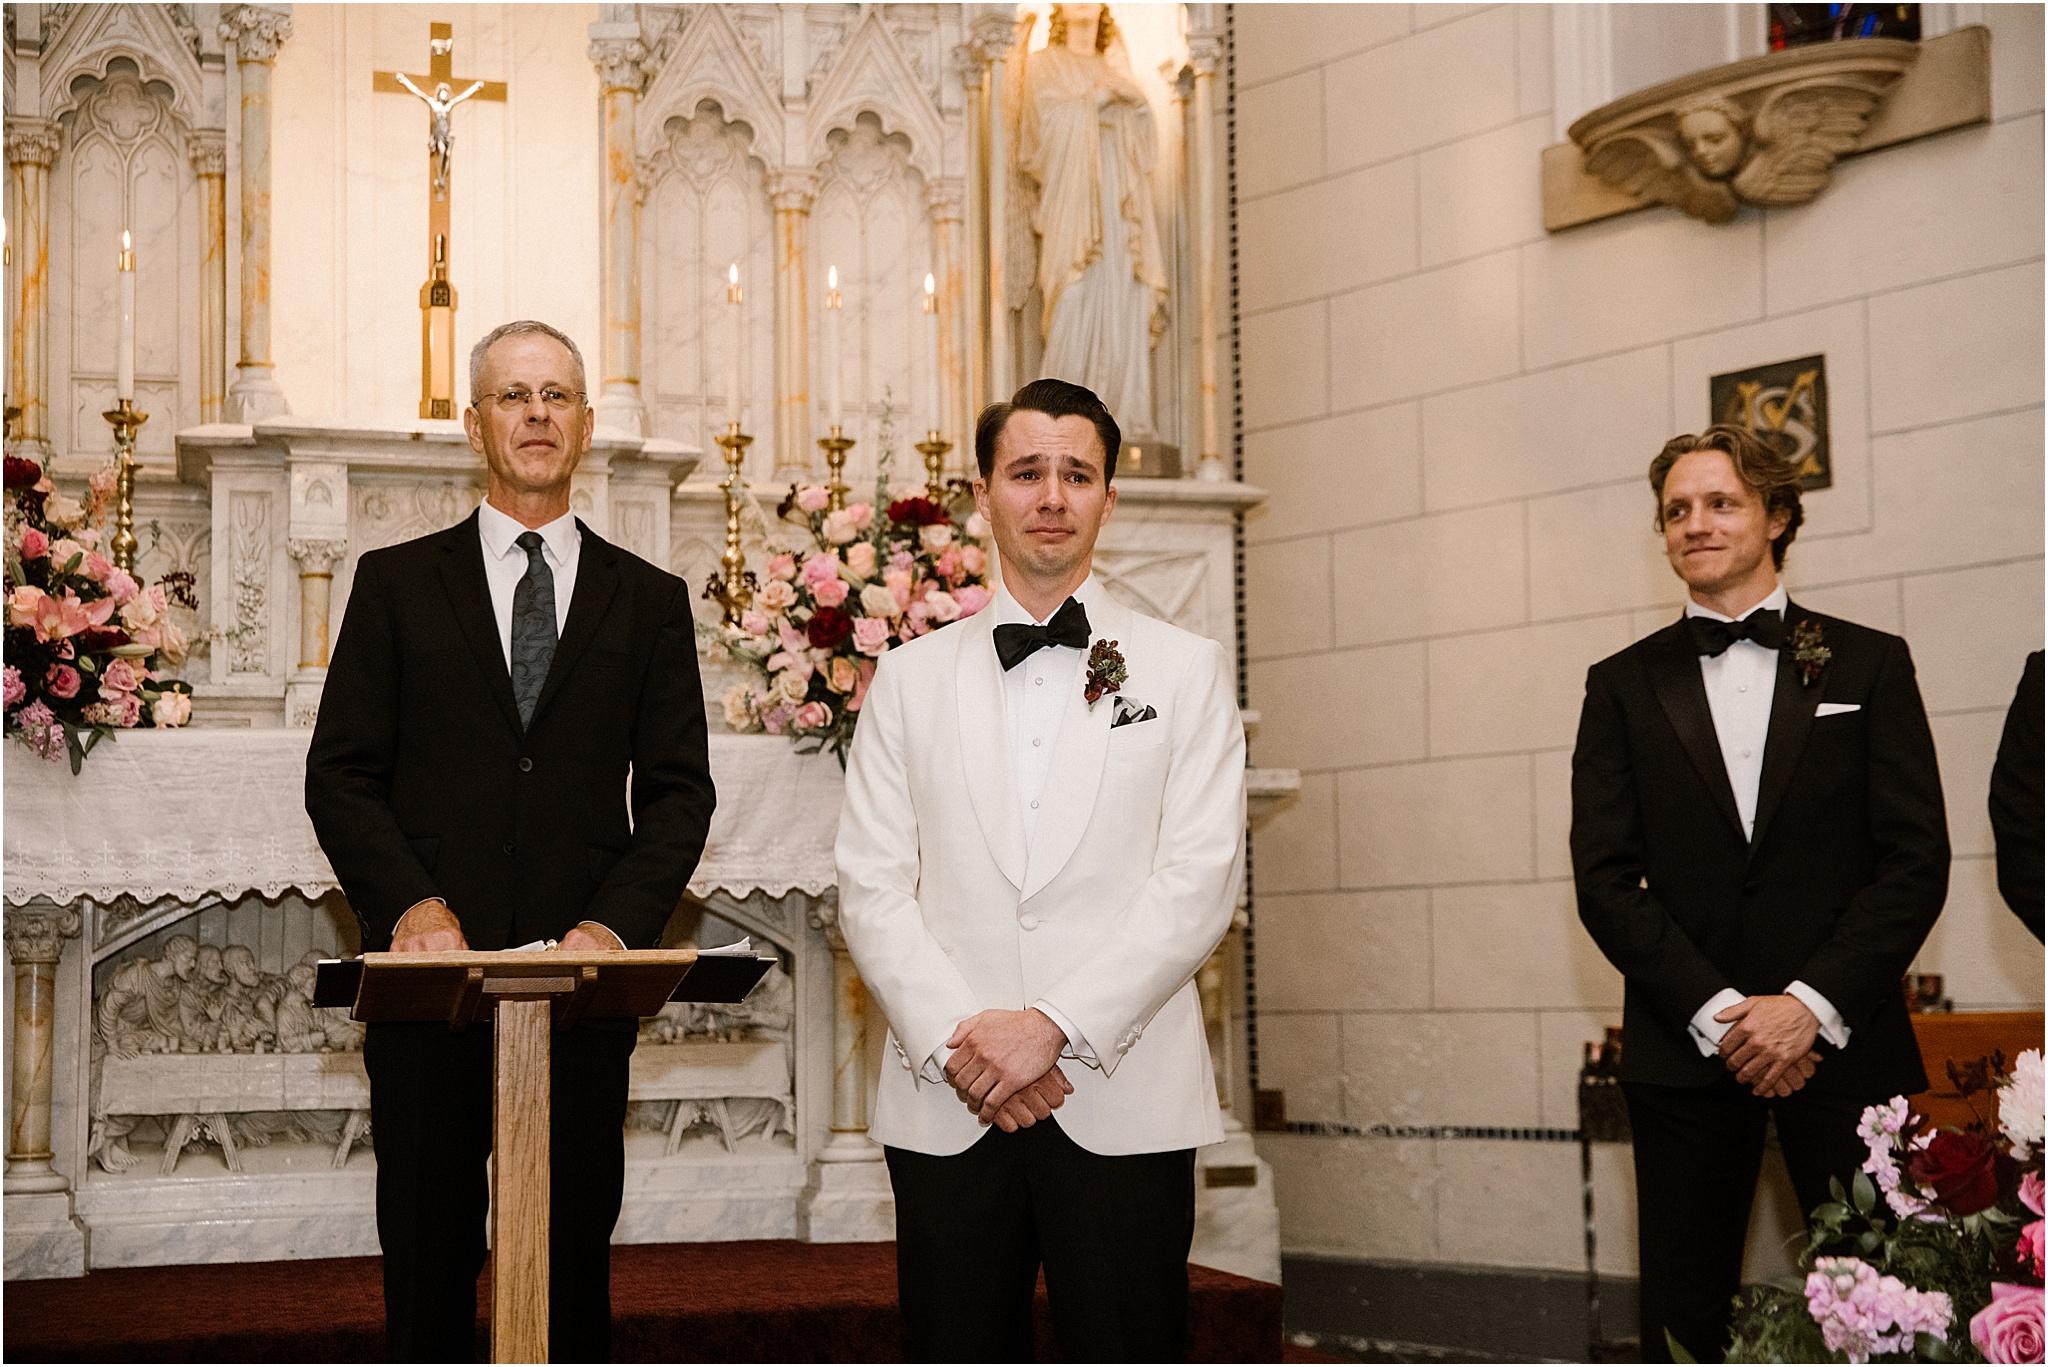 BLUE ROSE PHOTOGRAPHY SANTA FE WEDDING_22